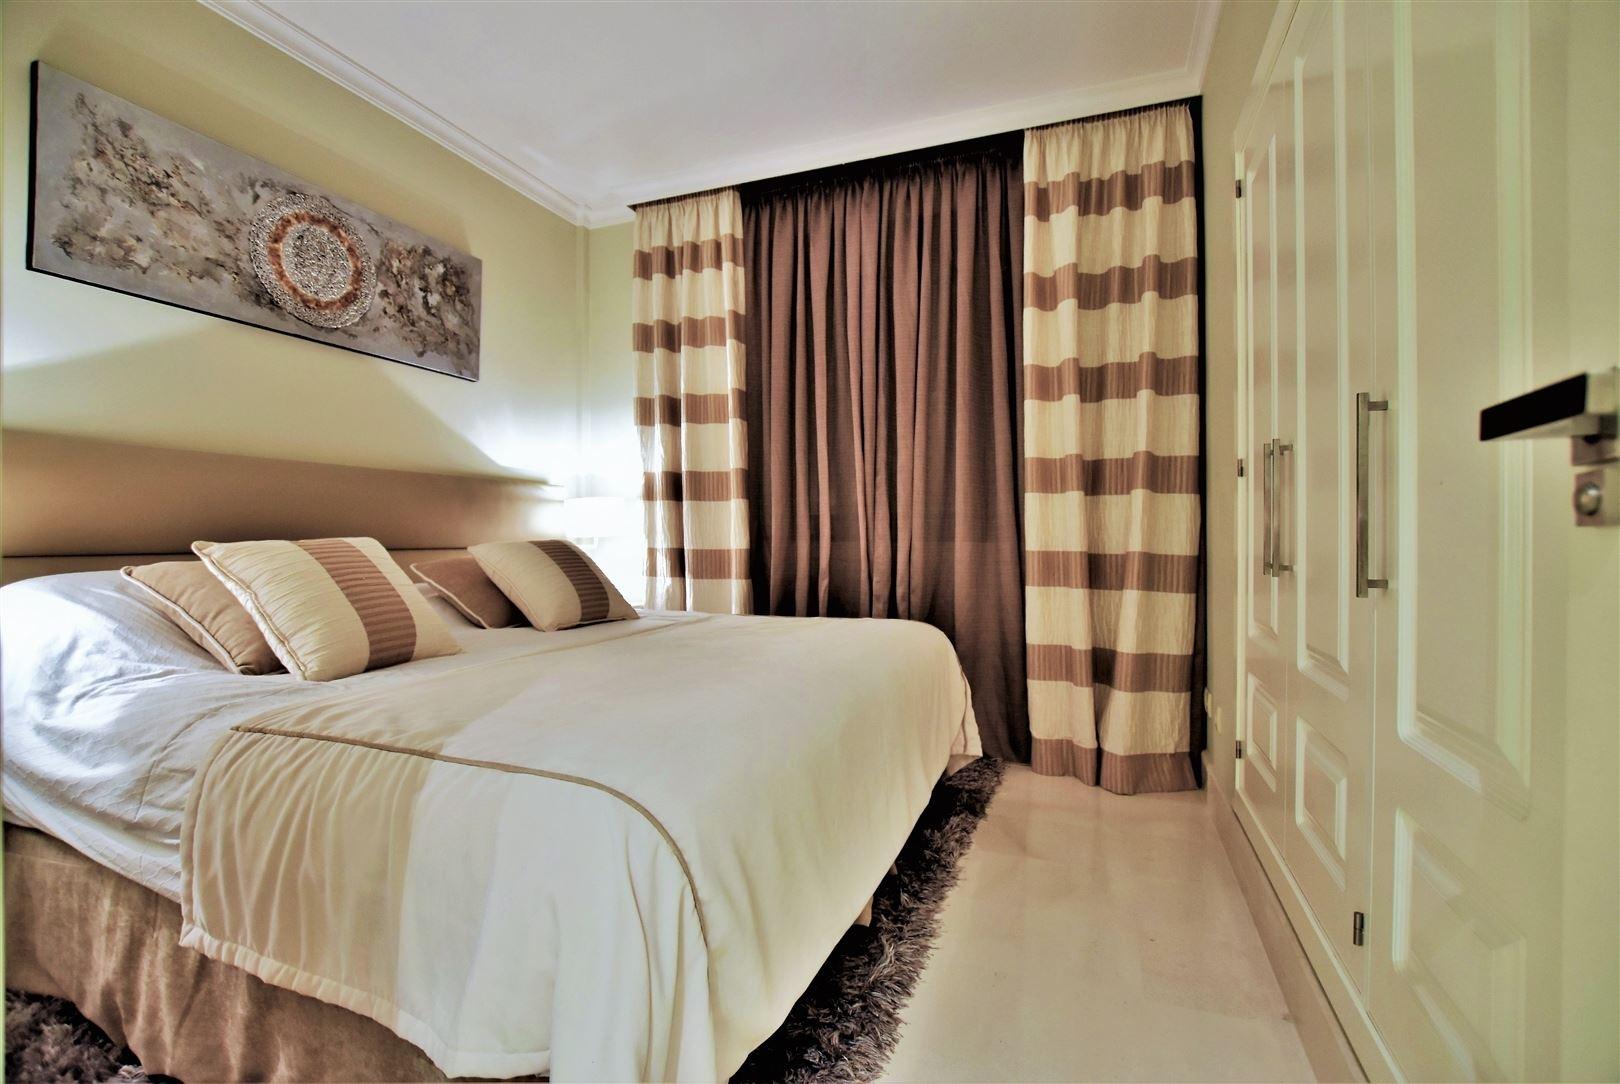 Foto 24 : Appartement te 29679 MARBELLA (Spanje) - Prijs € 1.750